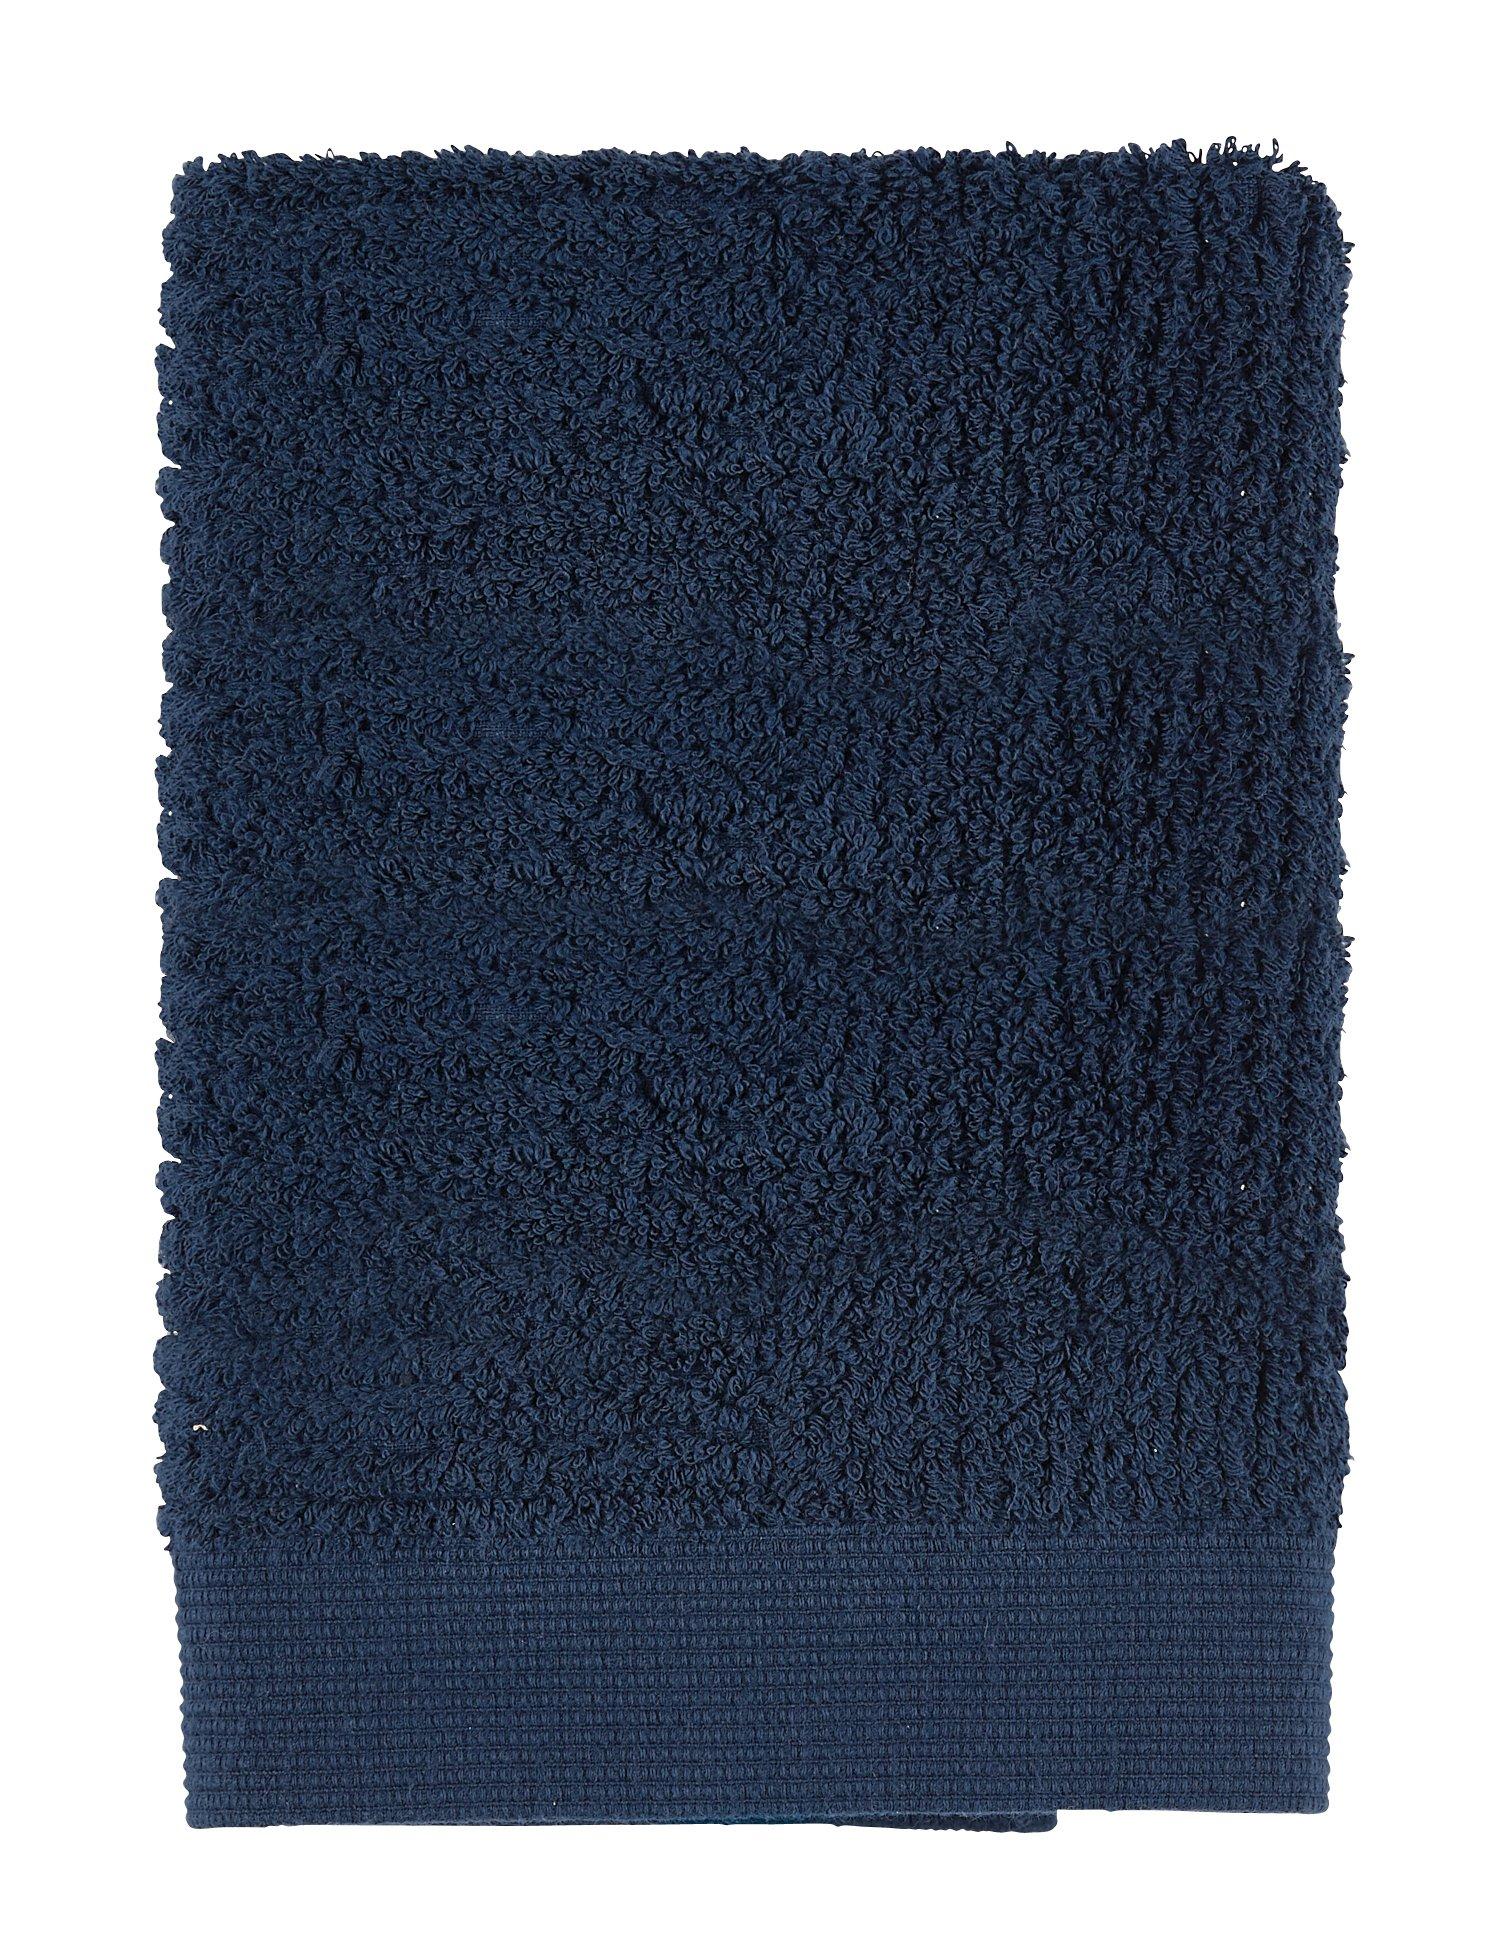 Zone - Classic Towel 50 x 70 cm - Dark Blue (330115)